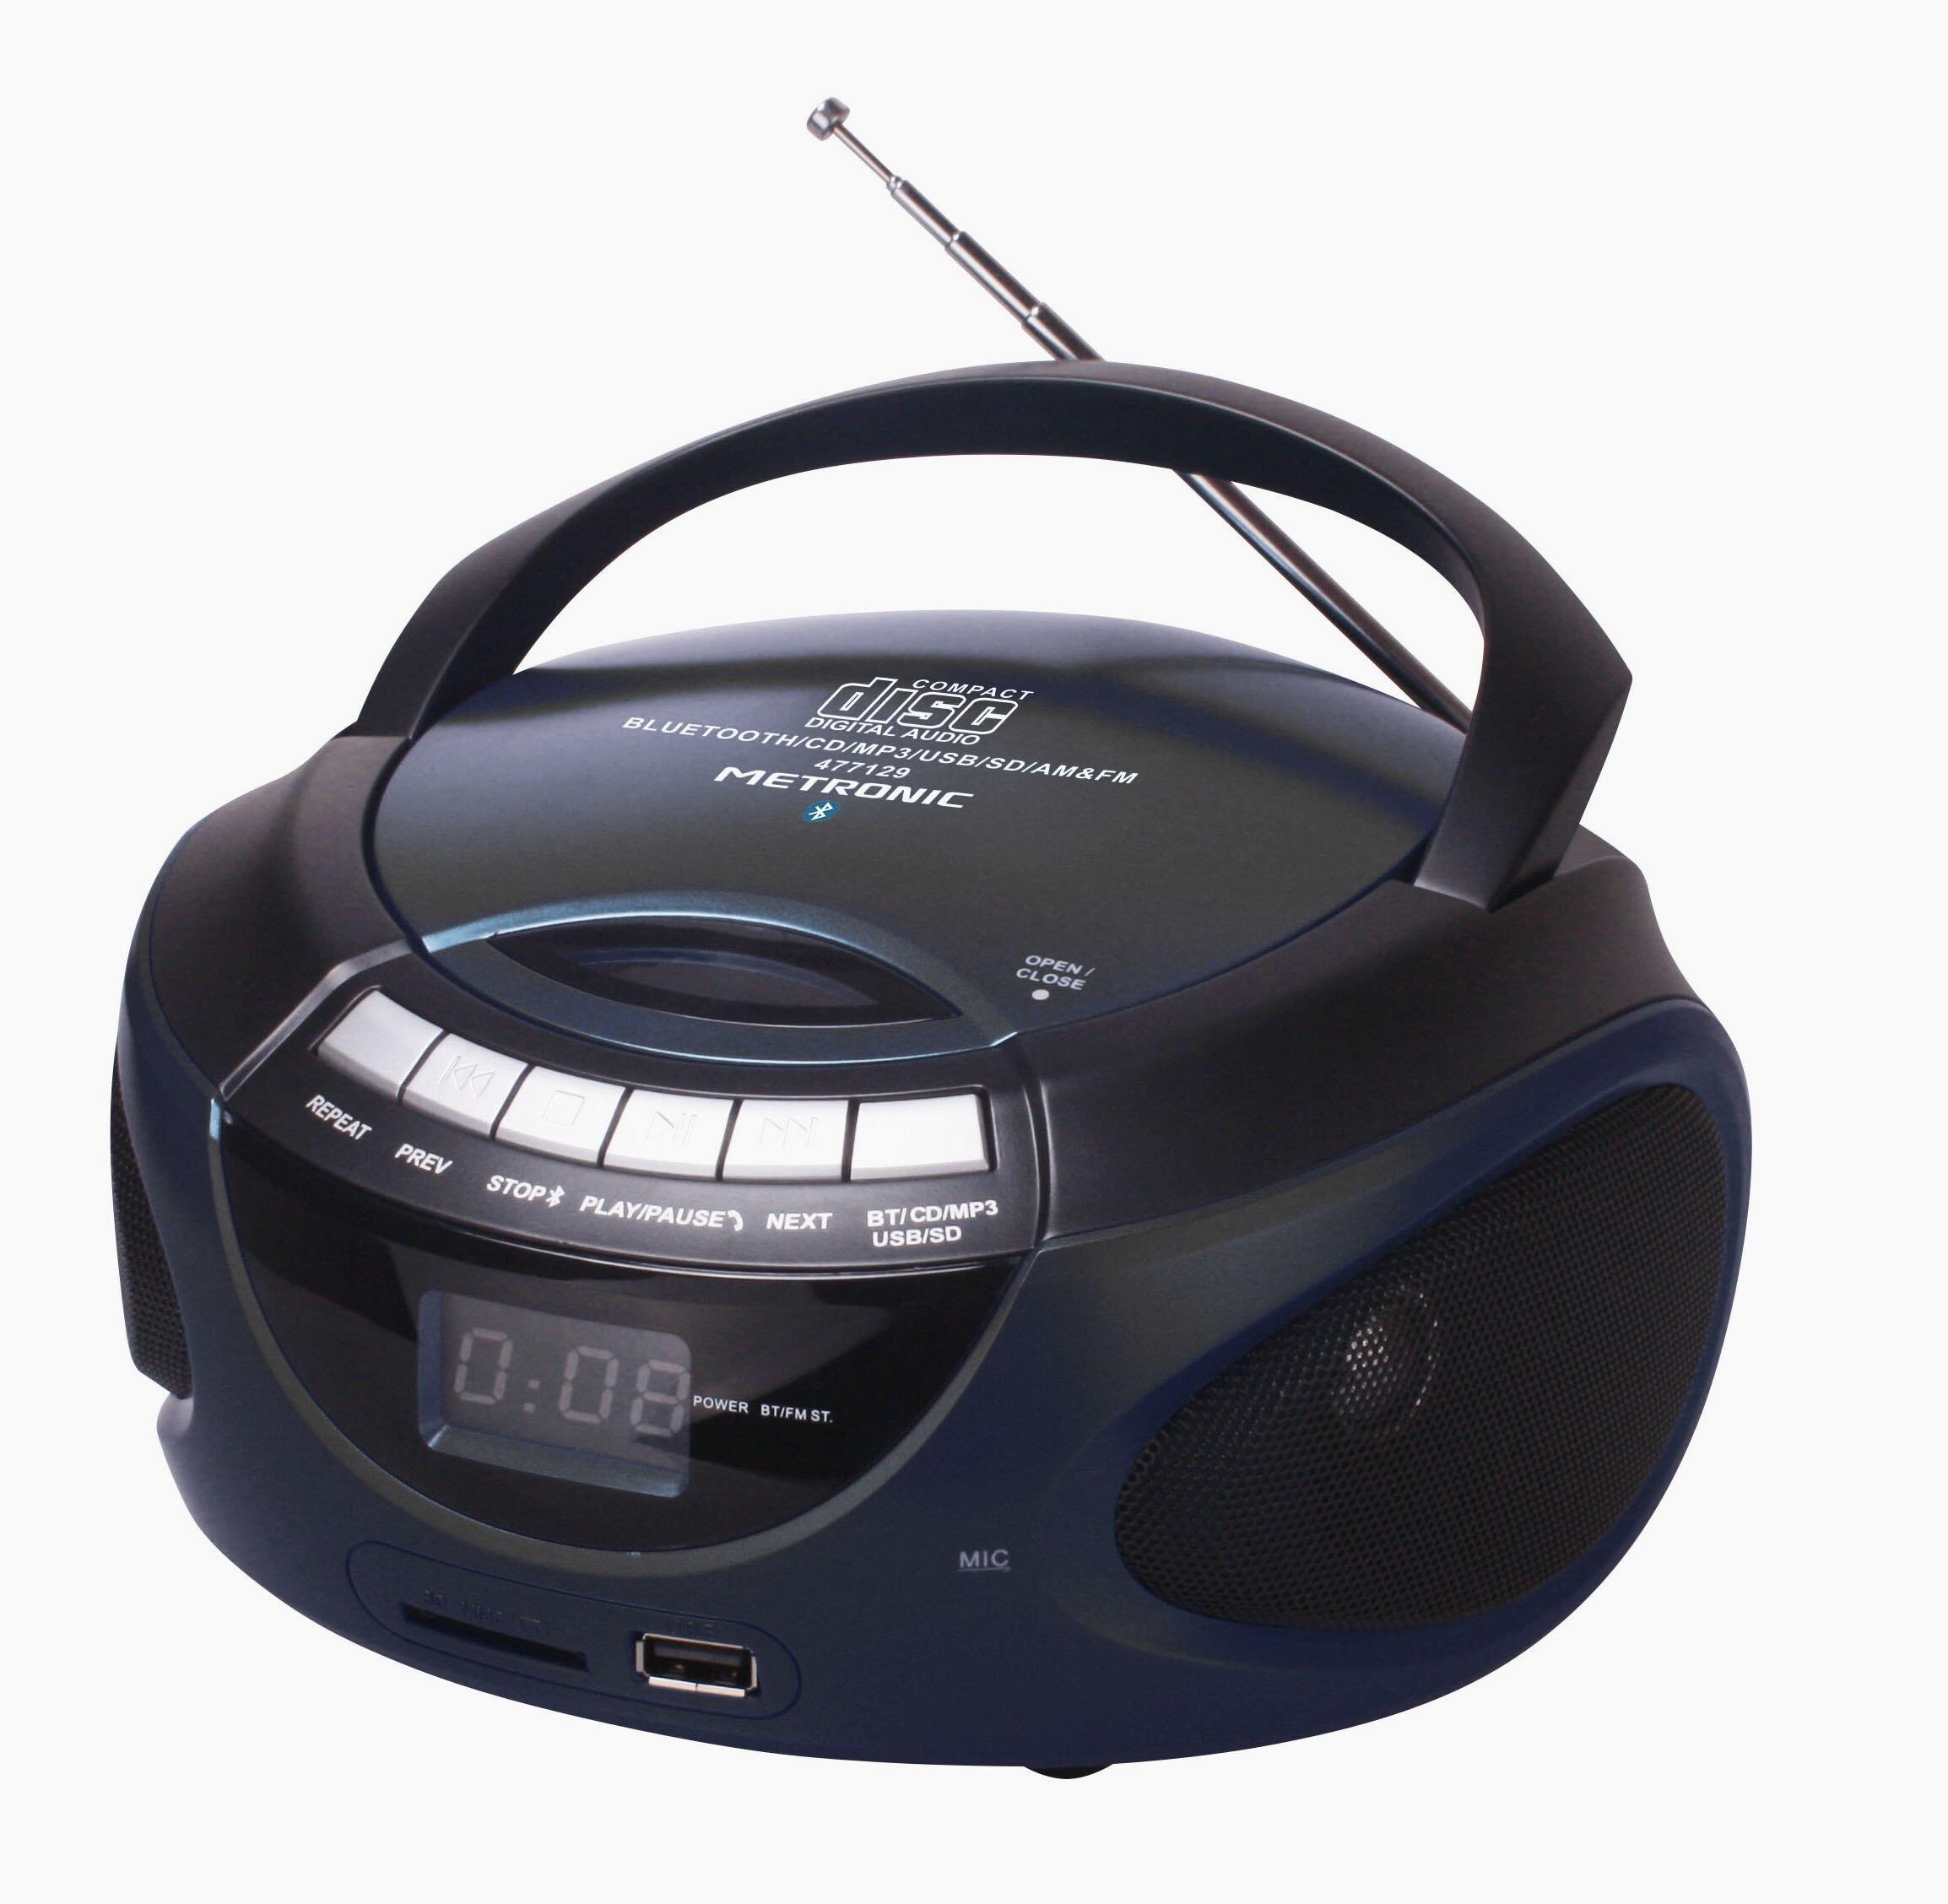 MP3 con Puerto USB Metronic Radio CD